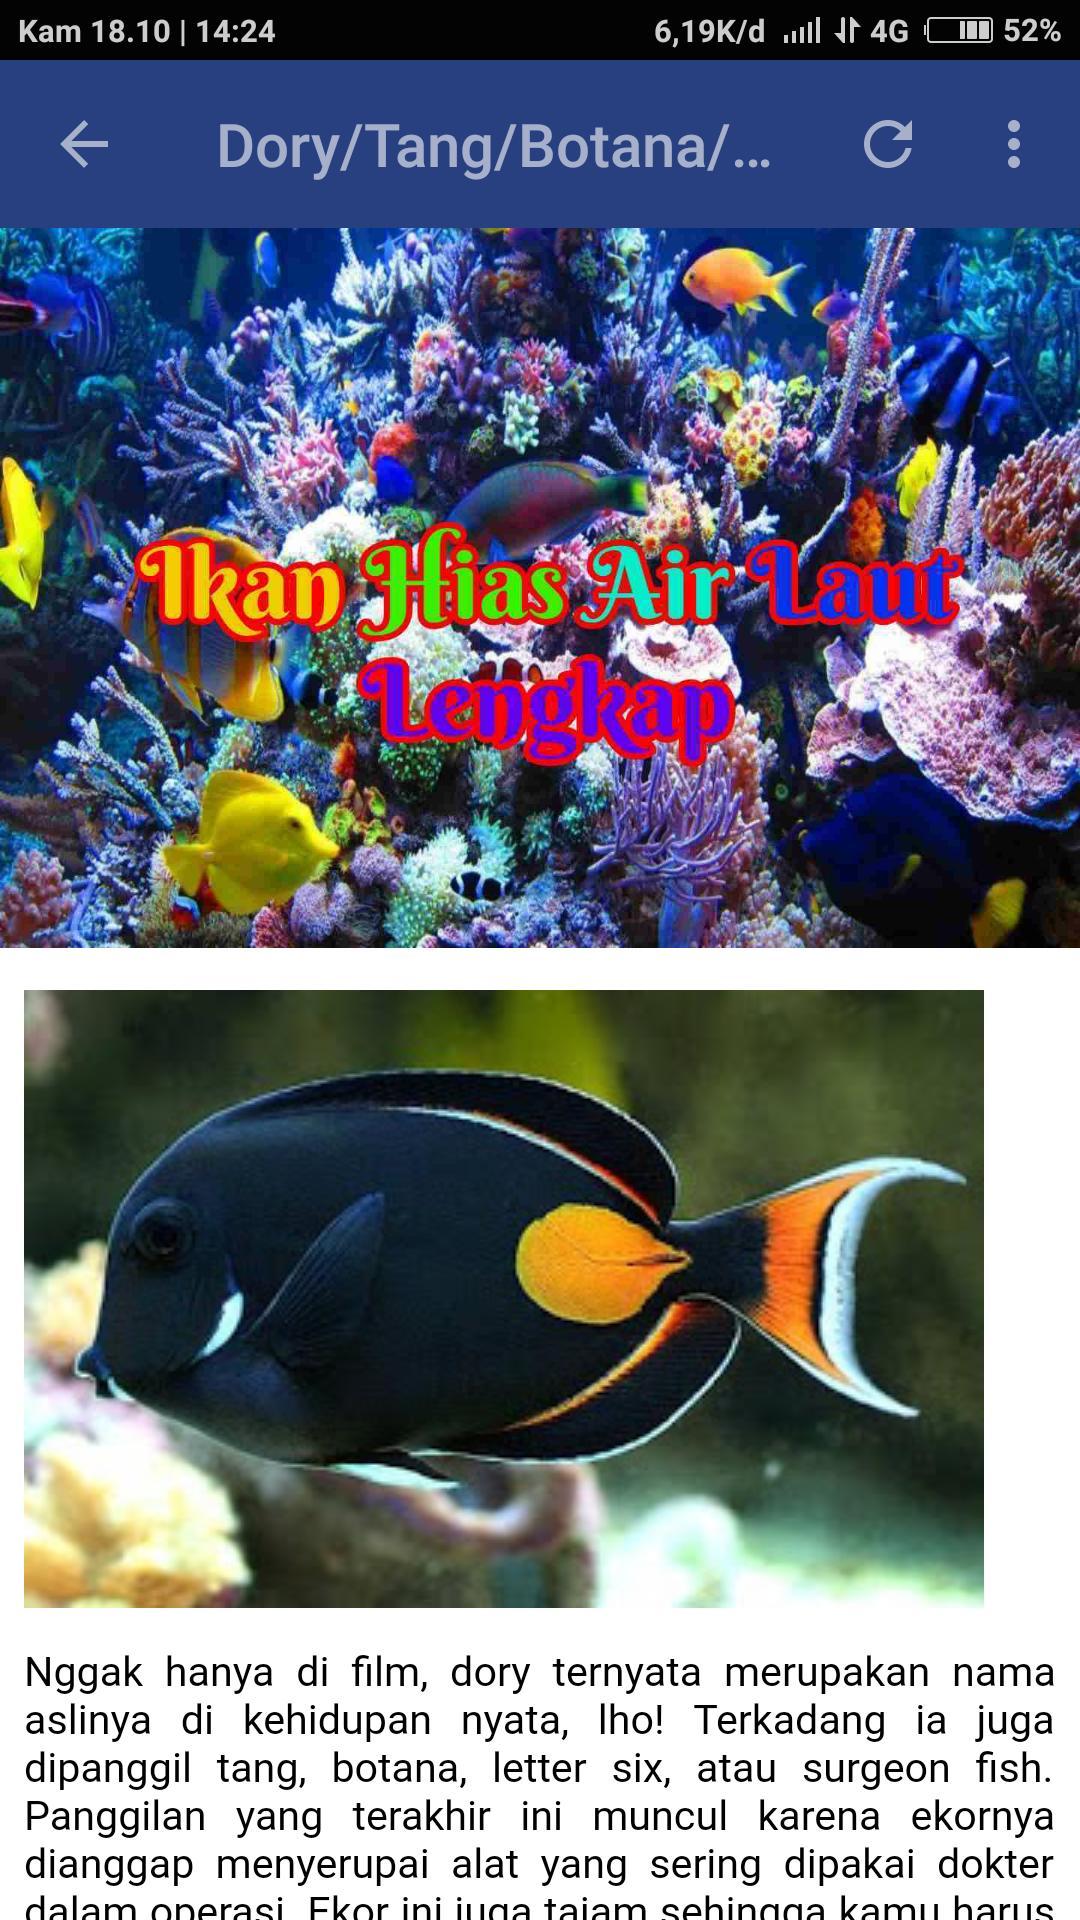 Jenis Ikan Hias Air Laut Dan Gambarnya Ikan Hias Air Laut Lengkap Para Android Apk Baixar